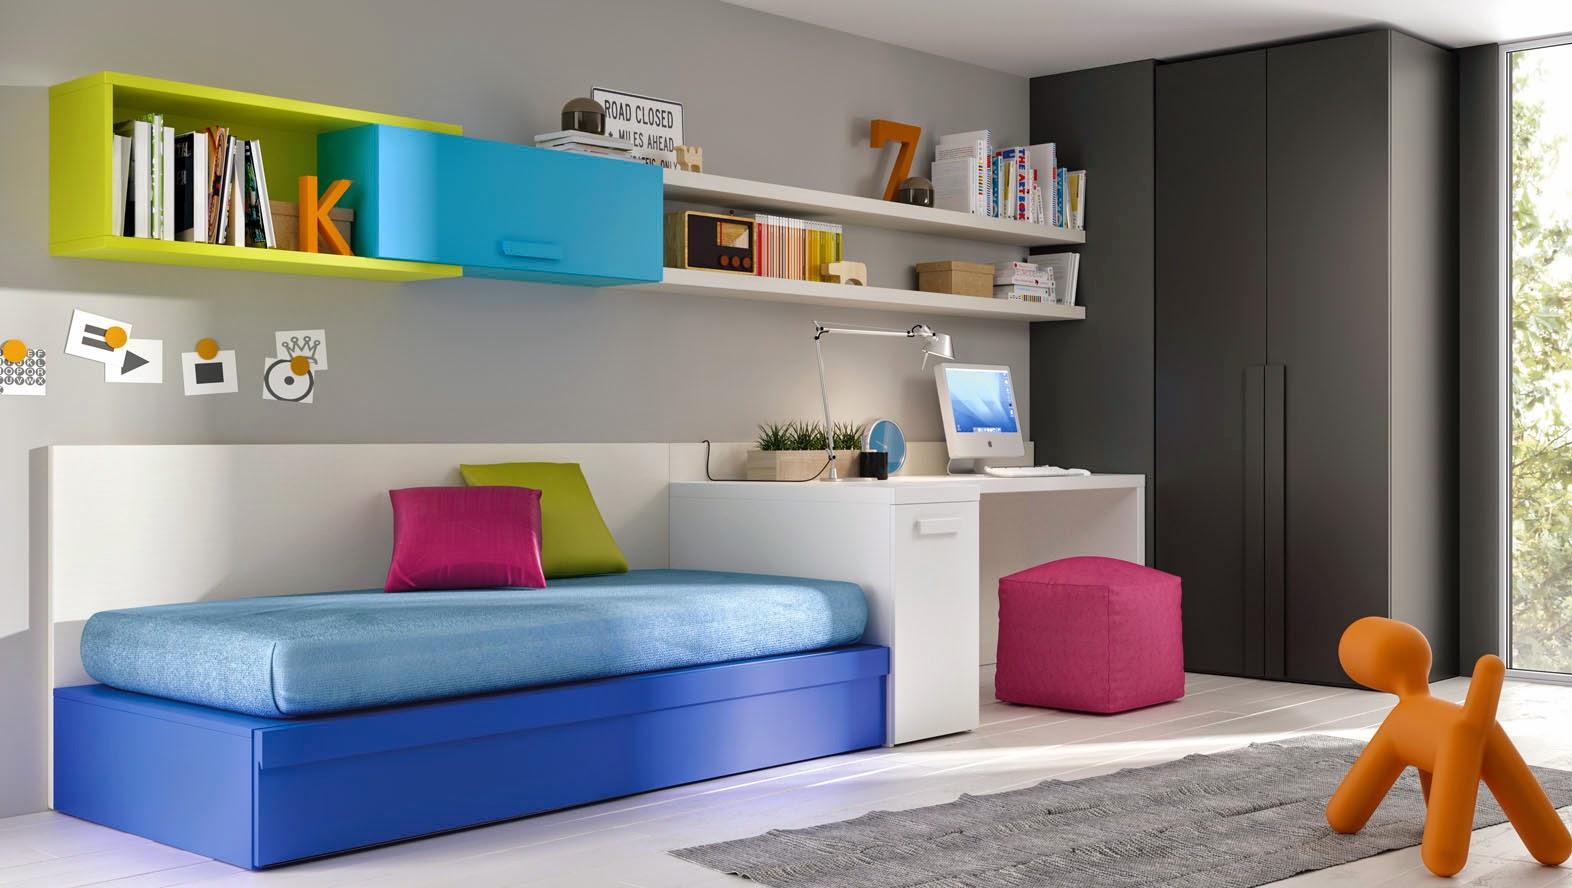 Juego dormitorio juvenil affordable madera baratos - Cuartos juveniles baratos ...